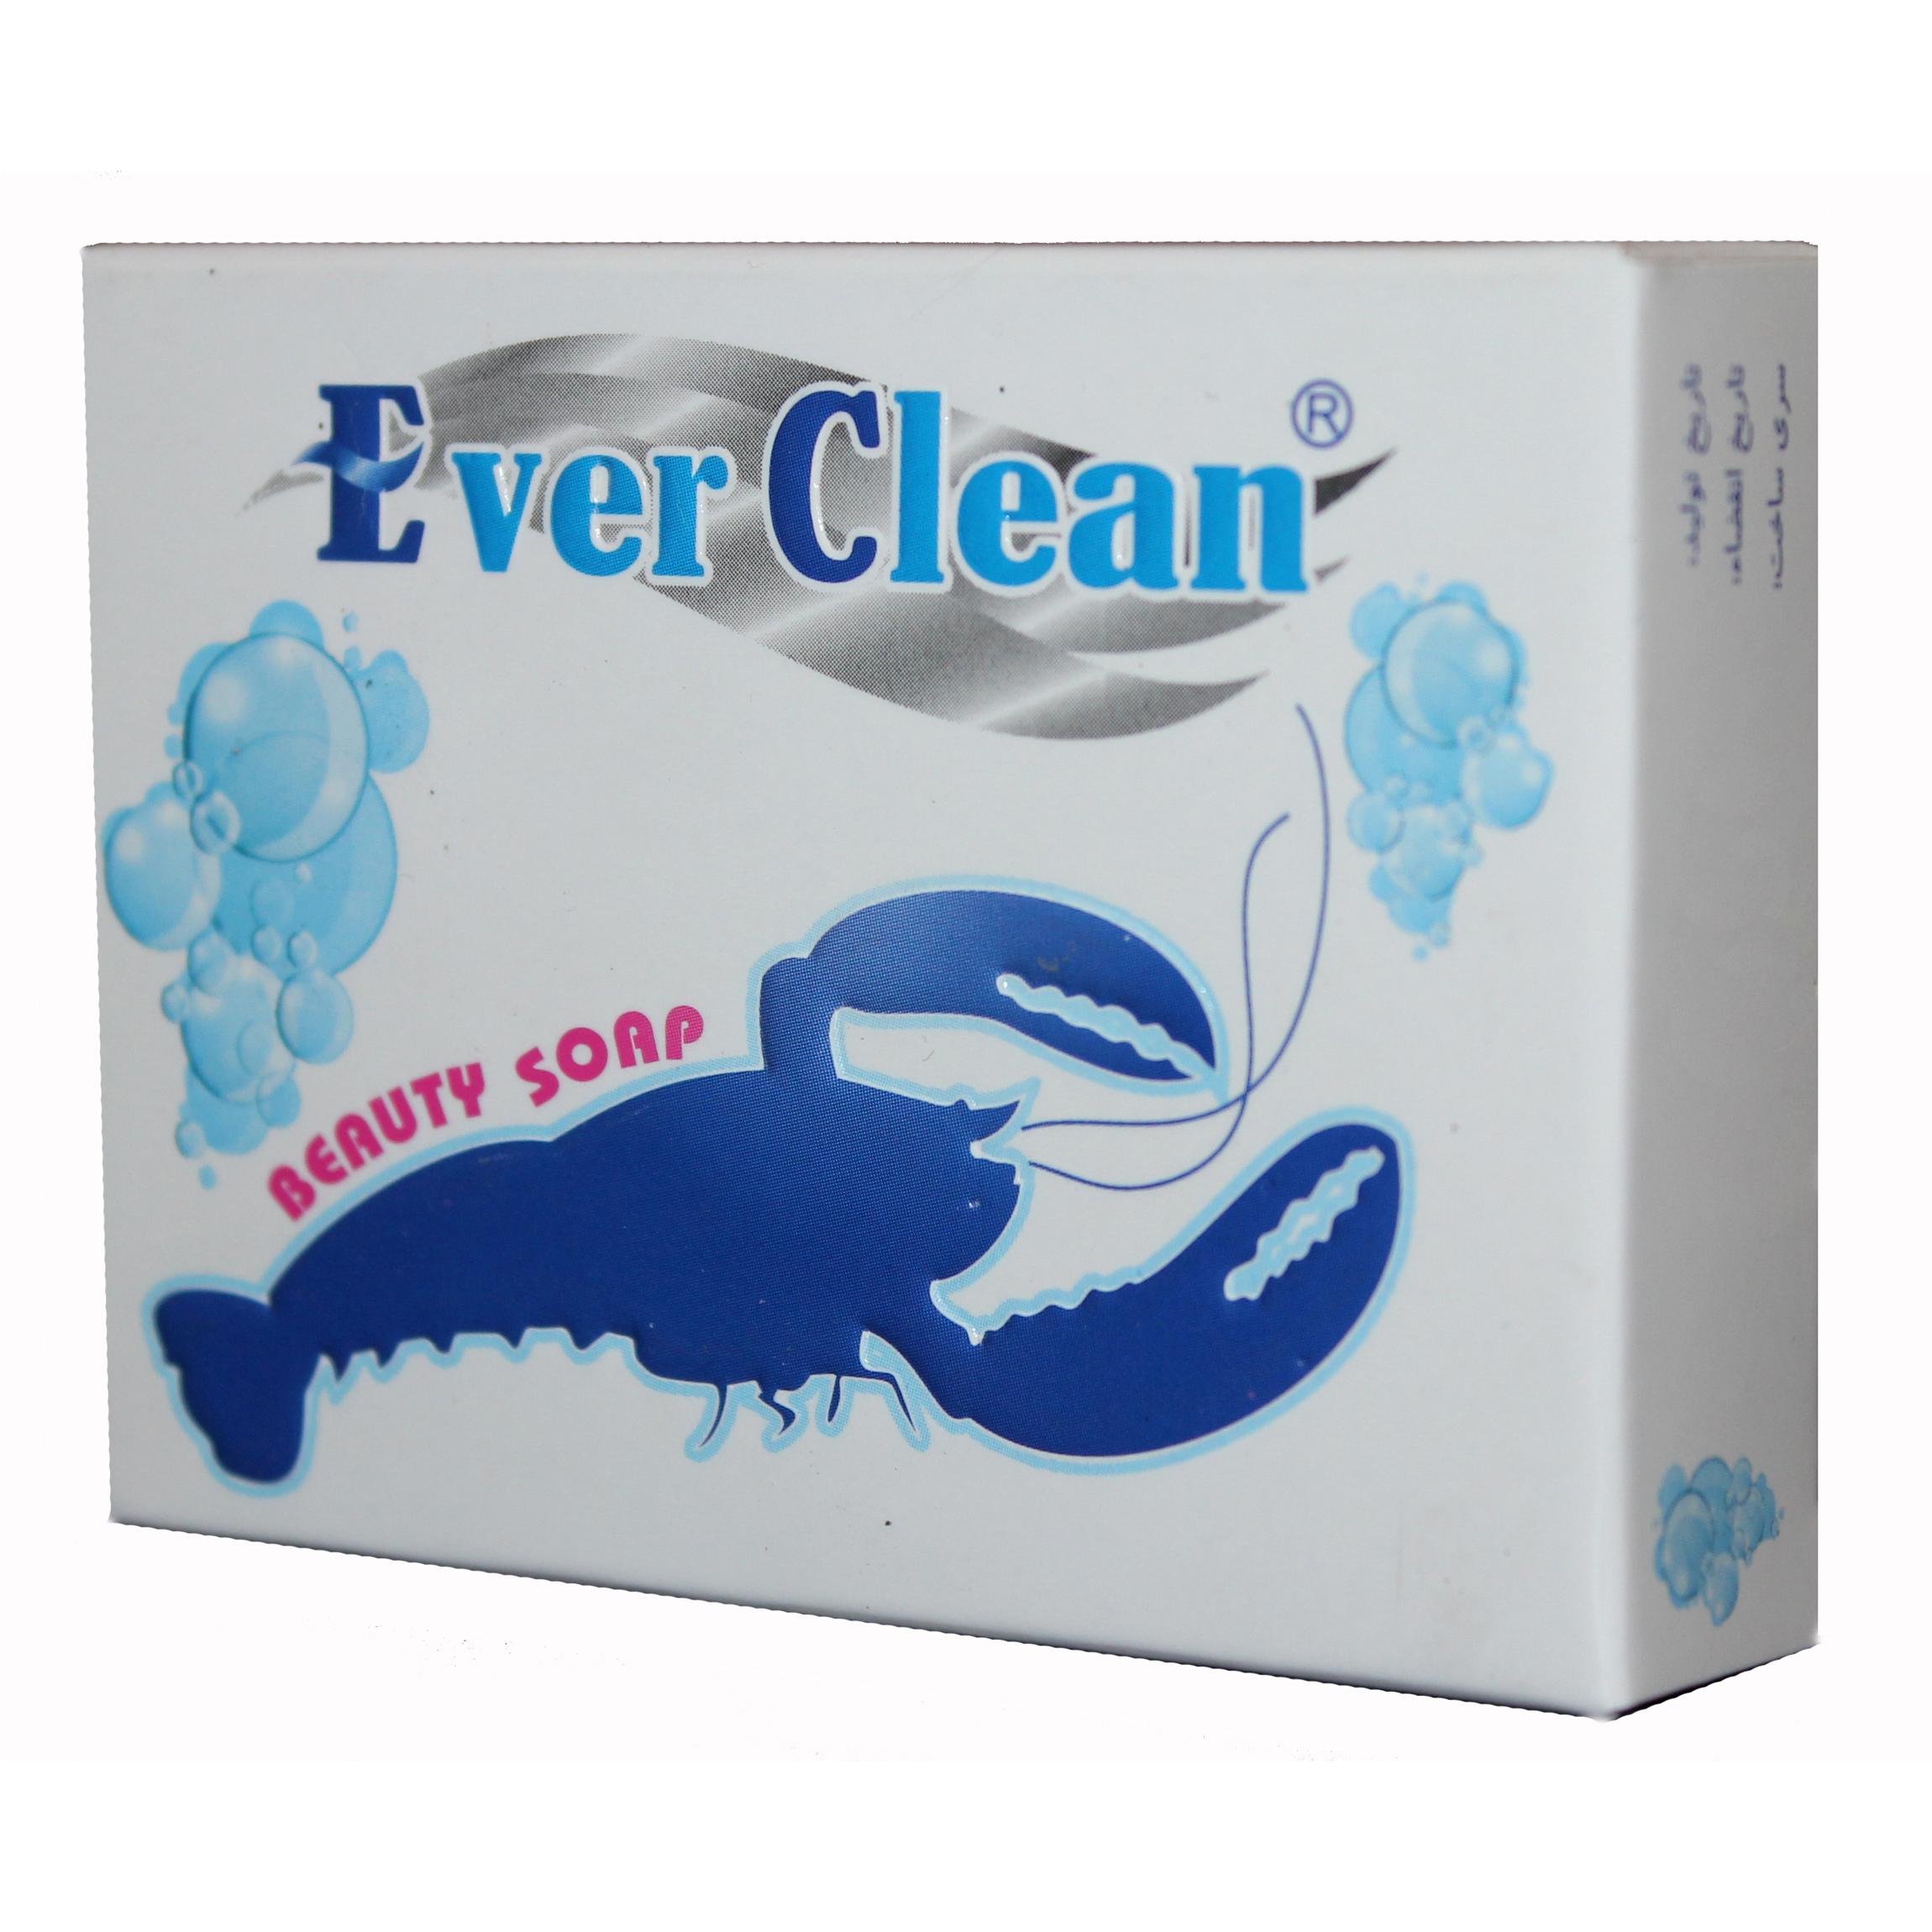 خرید                      صابون گلیسیرینه اورکلین مدل خرچنگ وزن 65 گرم